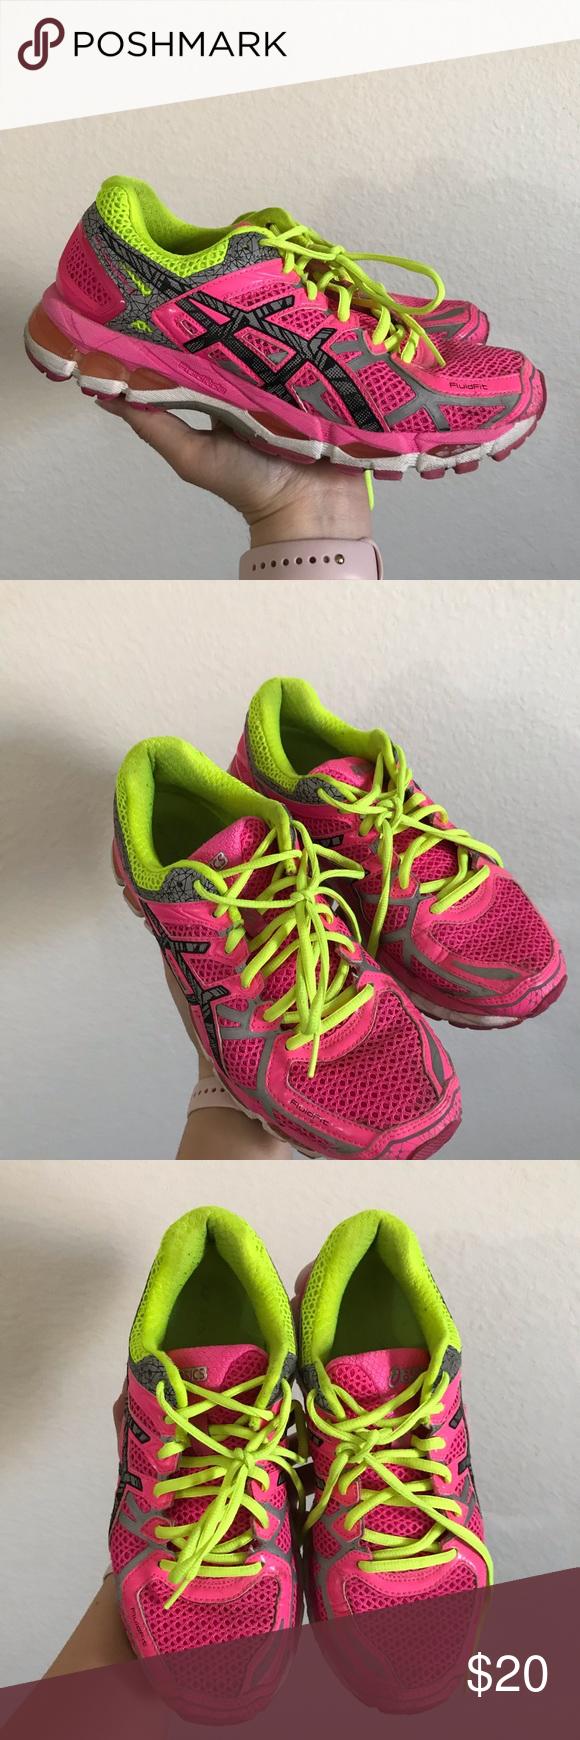 Asics Pink workout Shoes Asics IGS